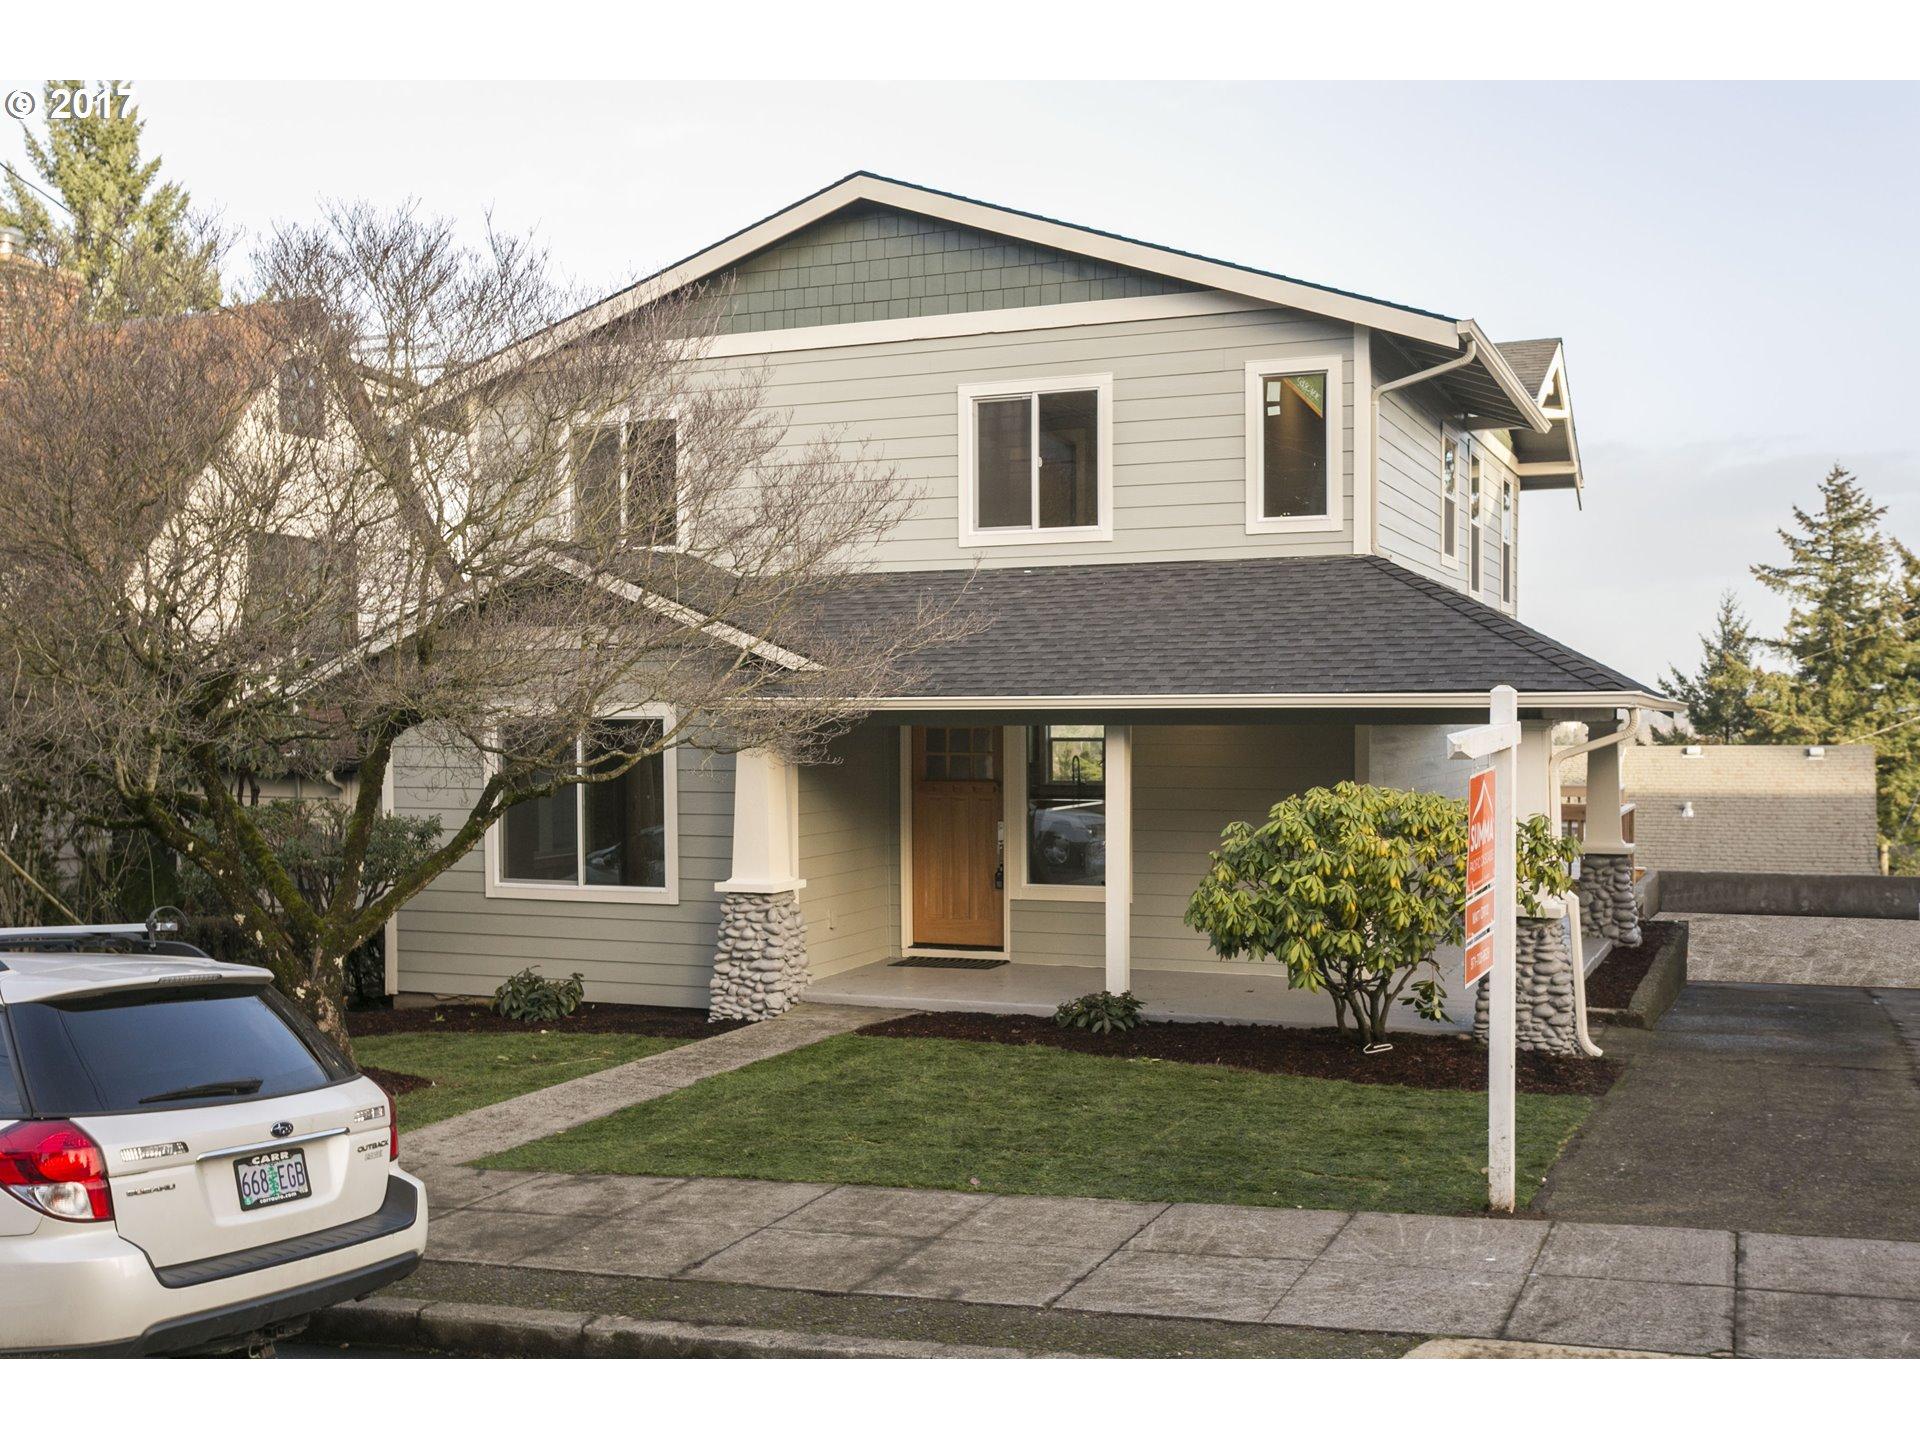 Mt tabor se portland oregon real estate homes for sale for 50th avenue salon portland